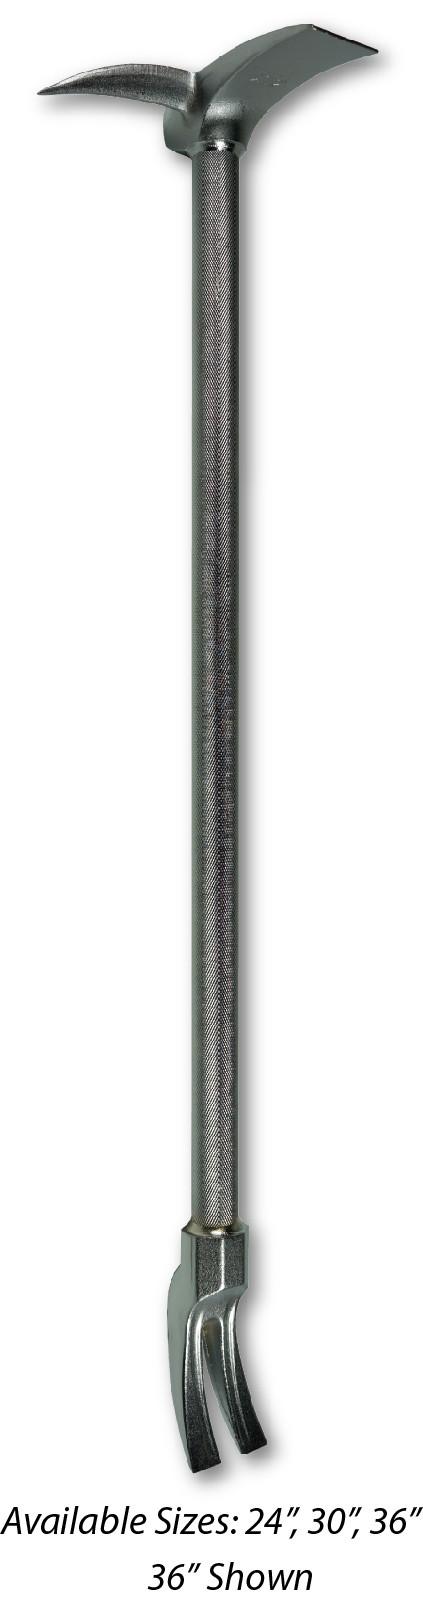 "NEW! ZT302-24 Alloy Entry Tool - Nickel 24"""